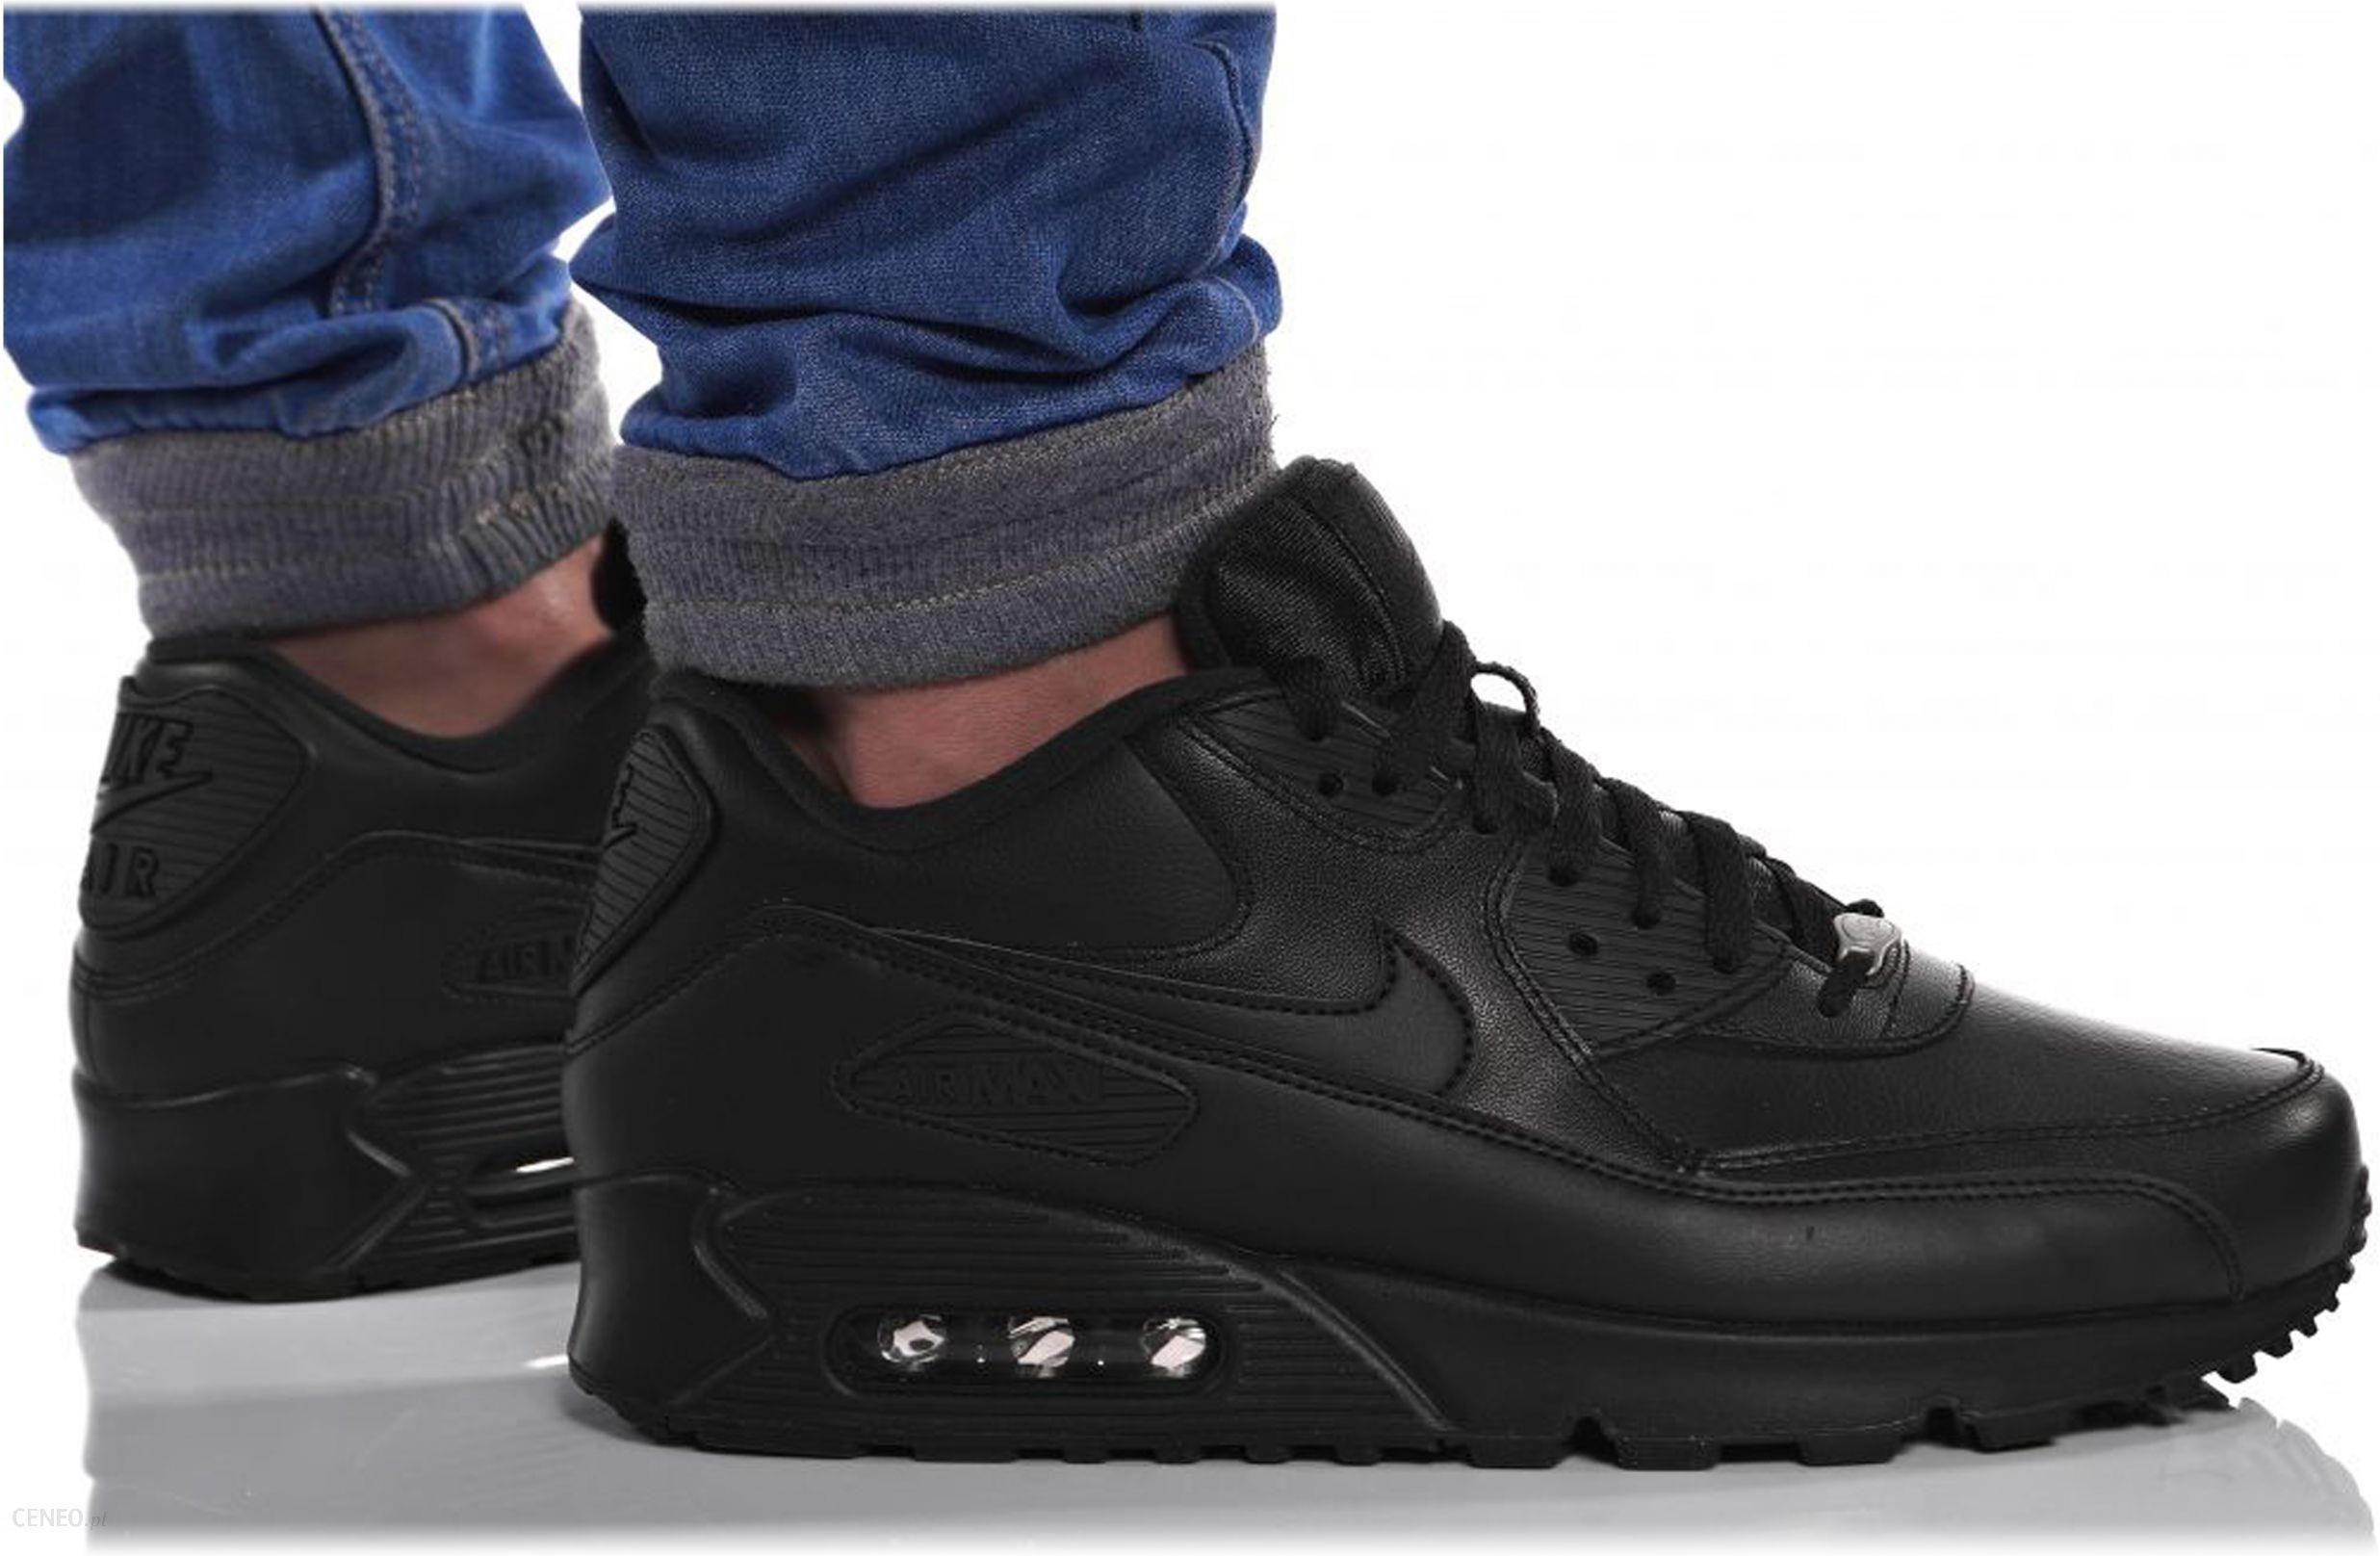 Buty Nike Air Max 90 Ultra Br 725222 600 czarne Ceny i